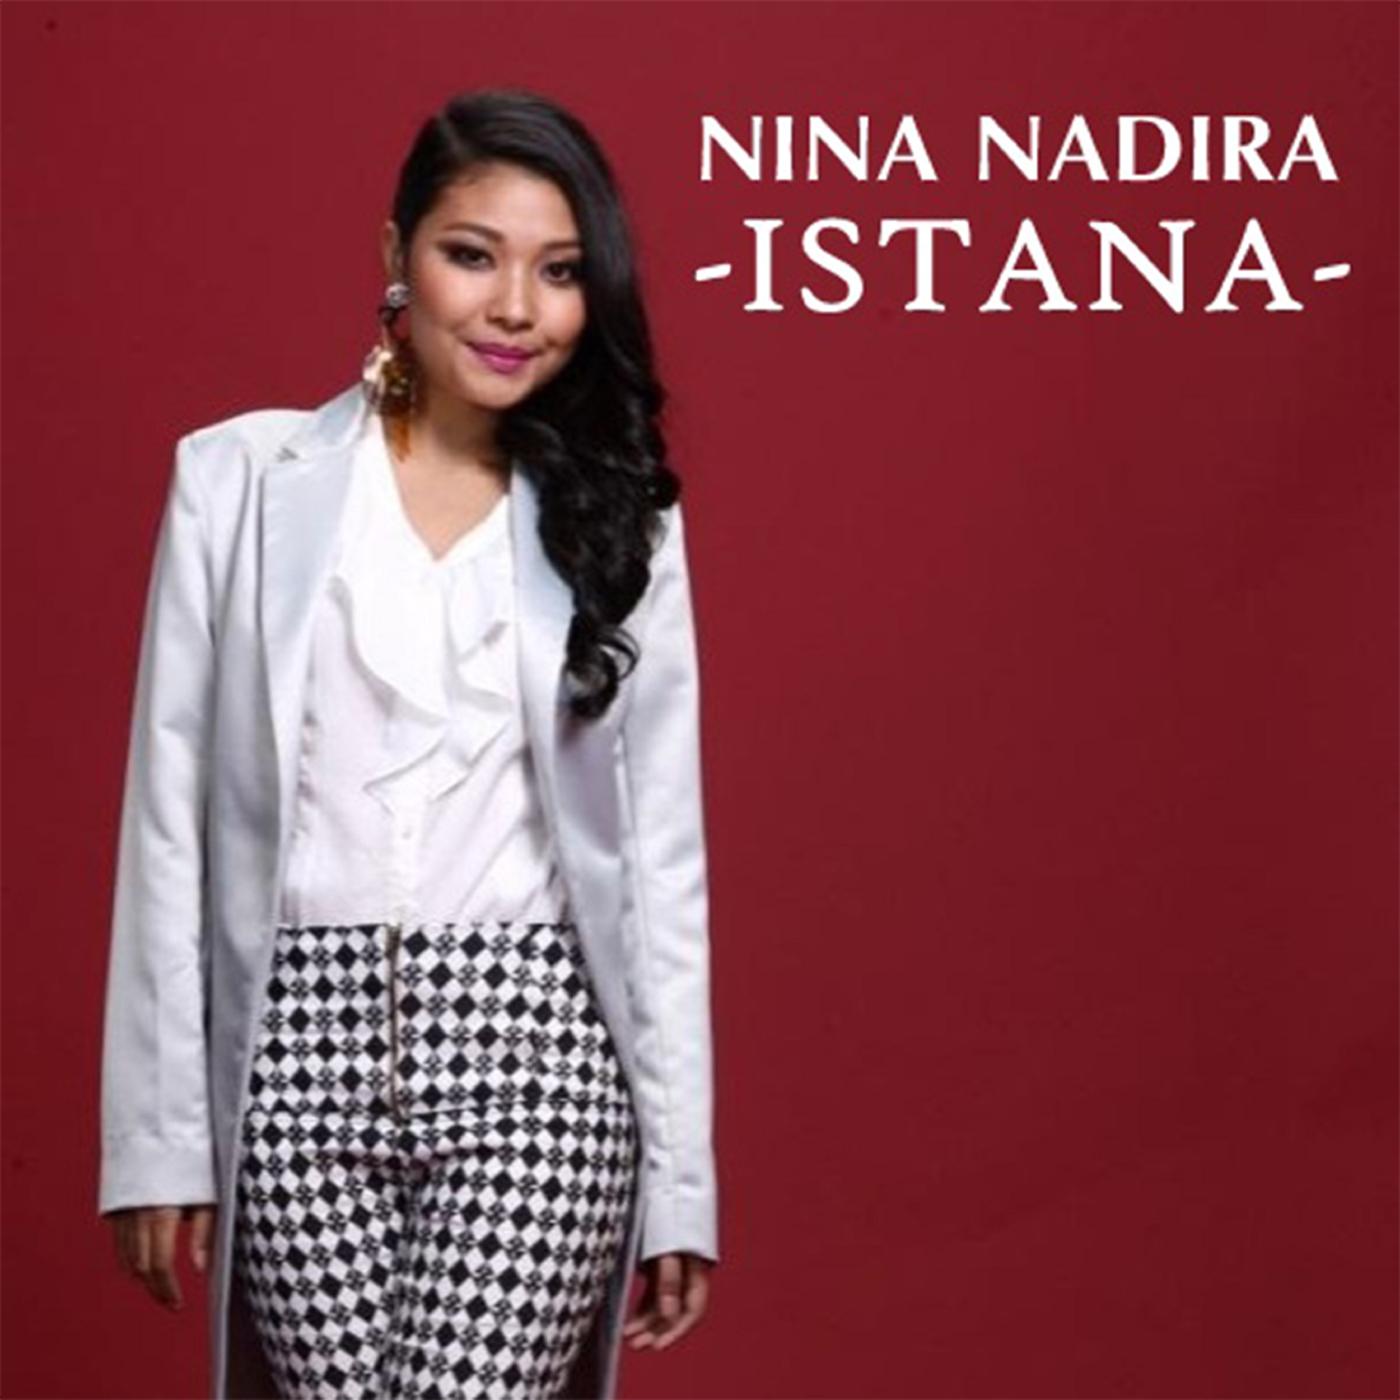 Istana - Nina Nadira